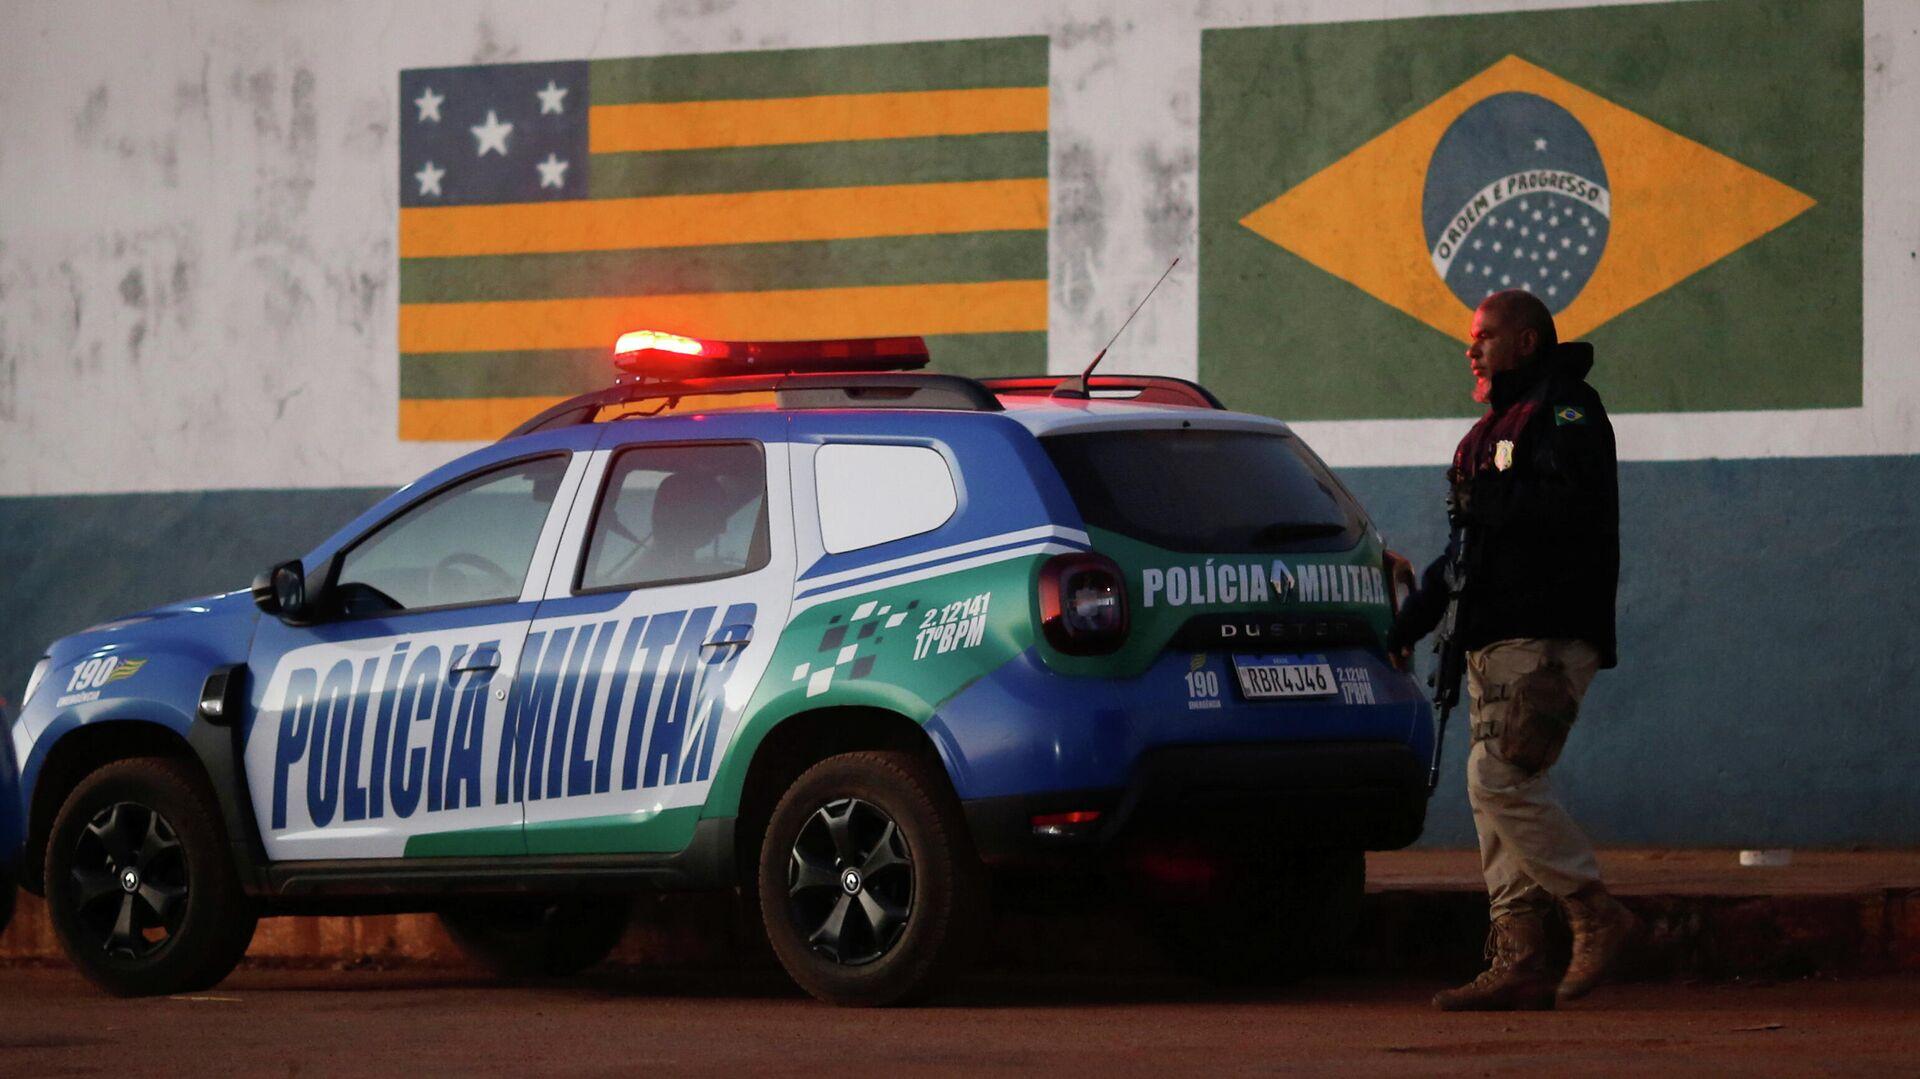 Policía brasileña buscando al presunto asesino Lázaro Barbosa - Sputnik Mundo, 1920, 28.06.2021